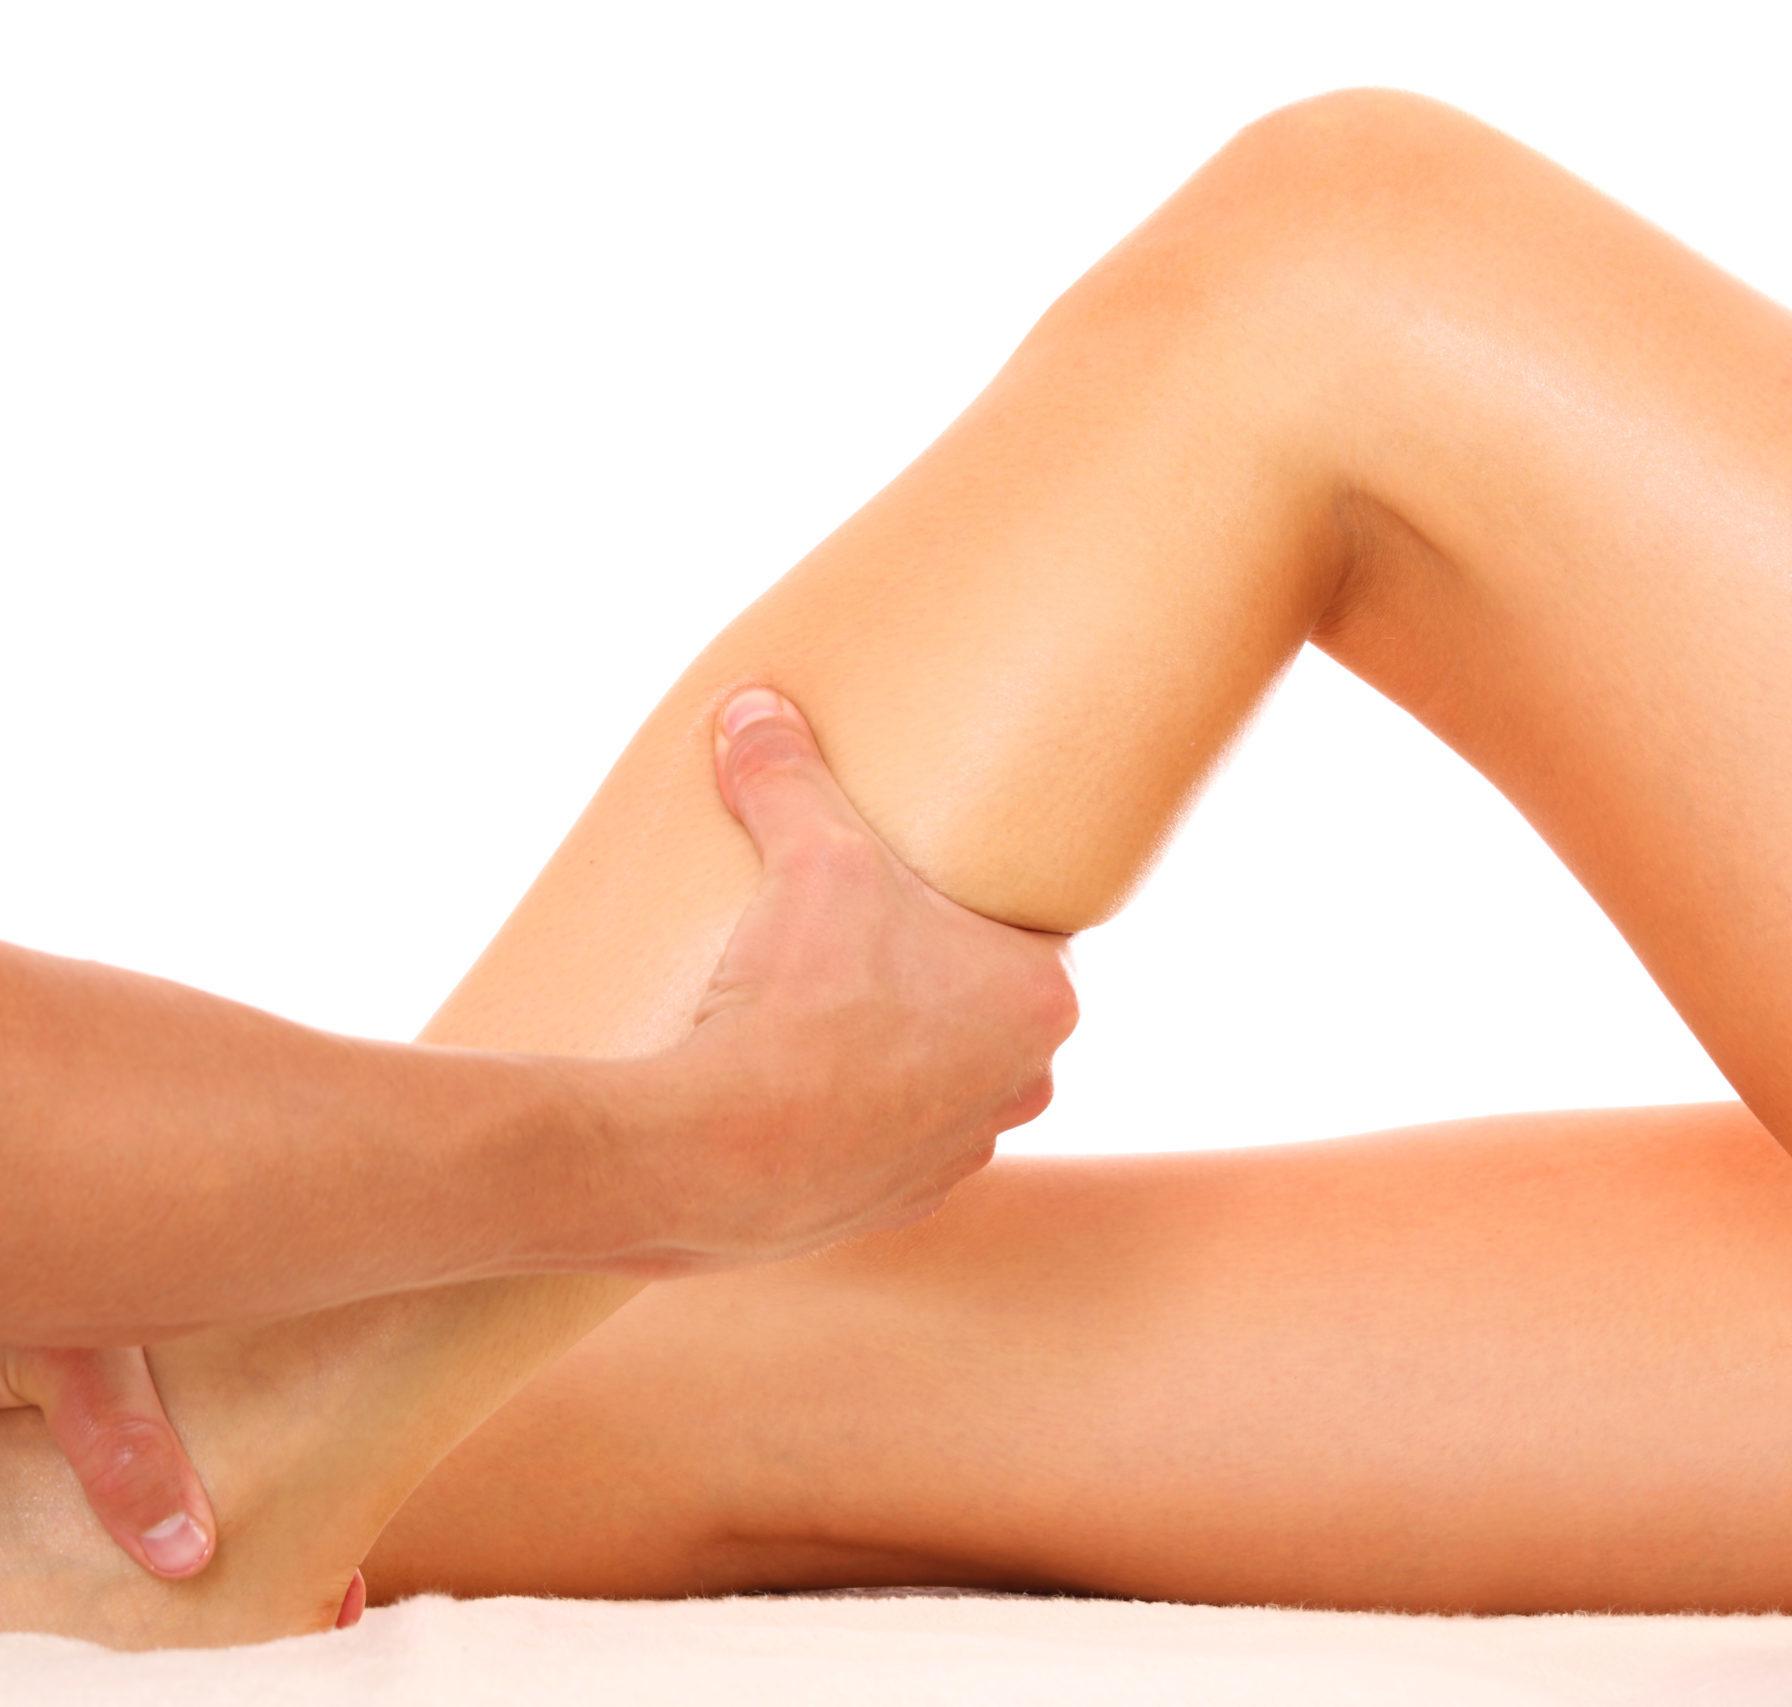 leziuni la genunchi decât să trateze durere articulație genunchi injecție